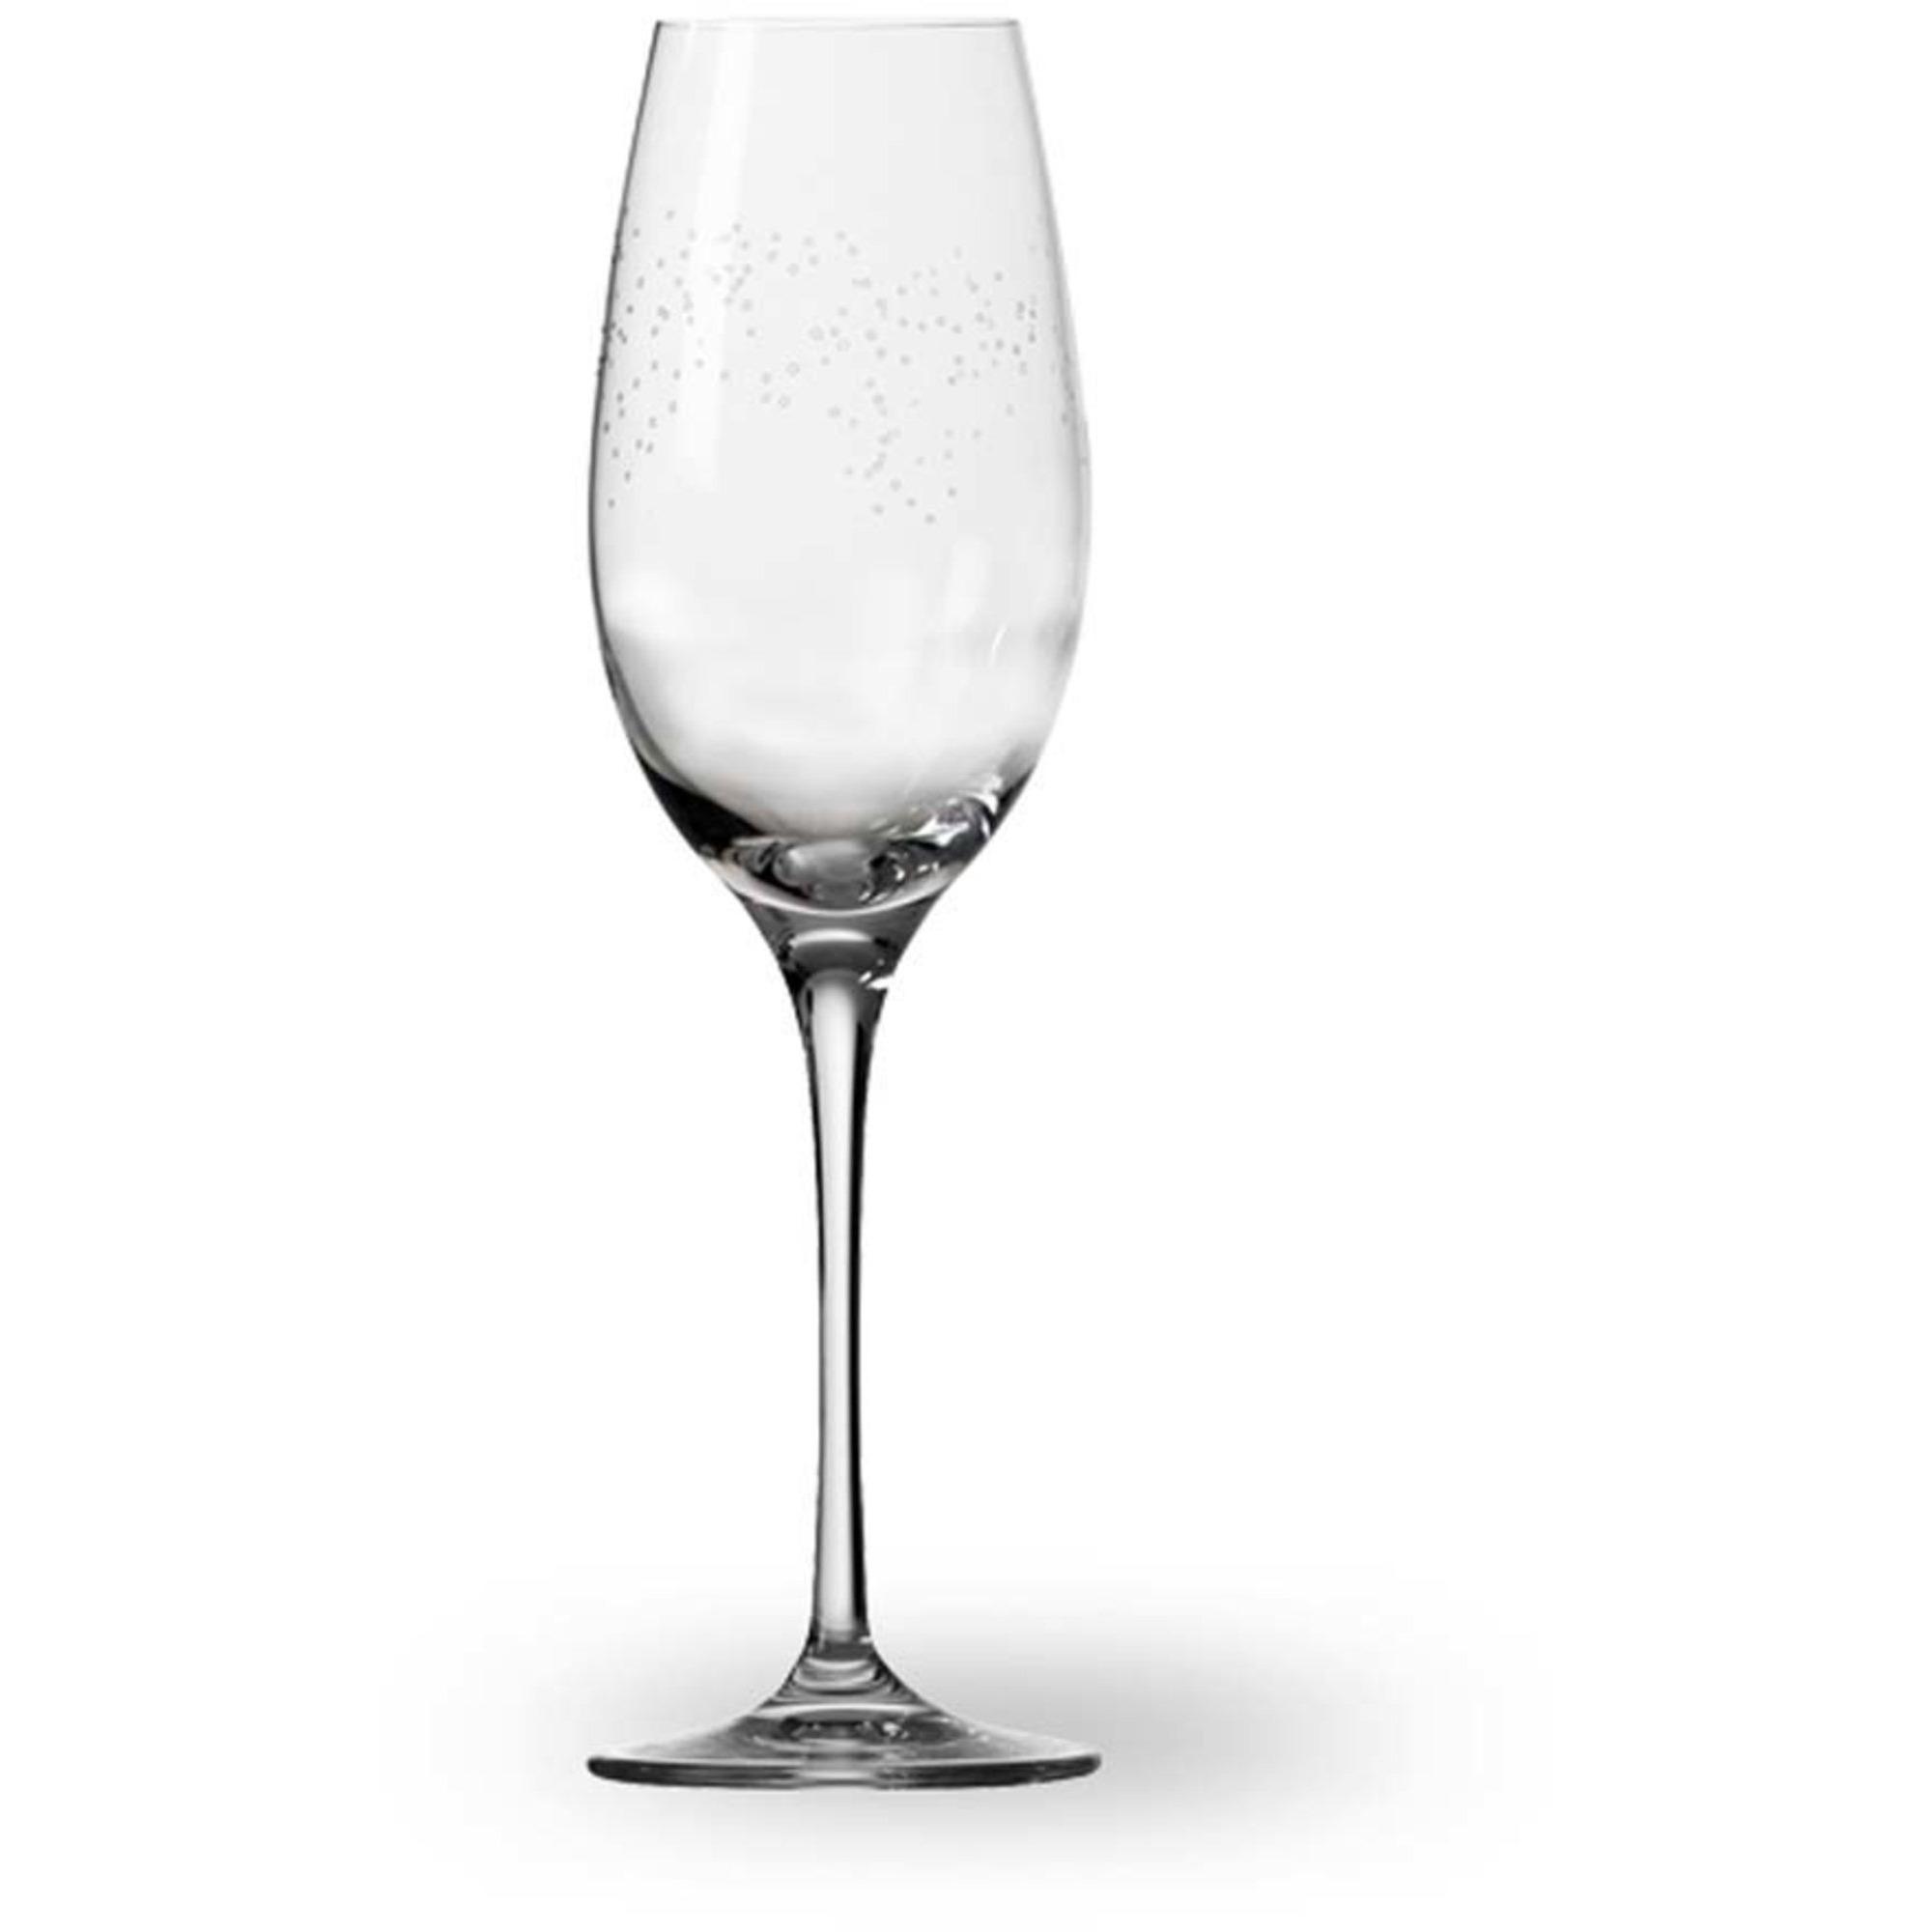 Wik & Walsøe Dugg Champagneglas 30 cl